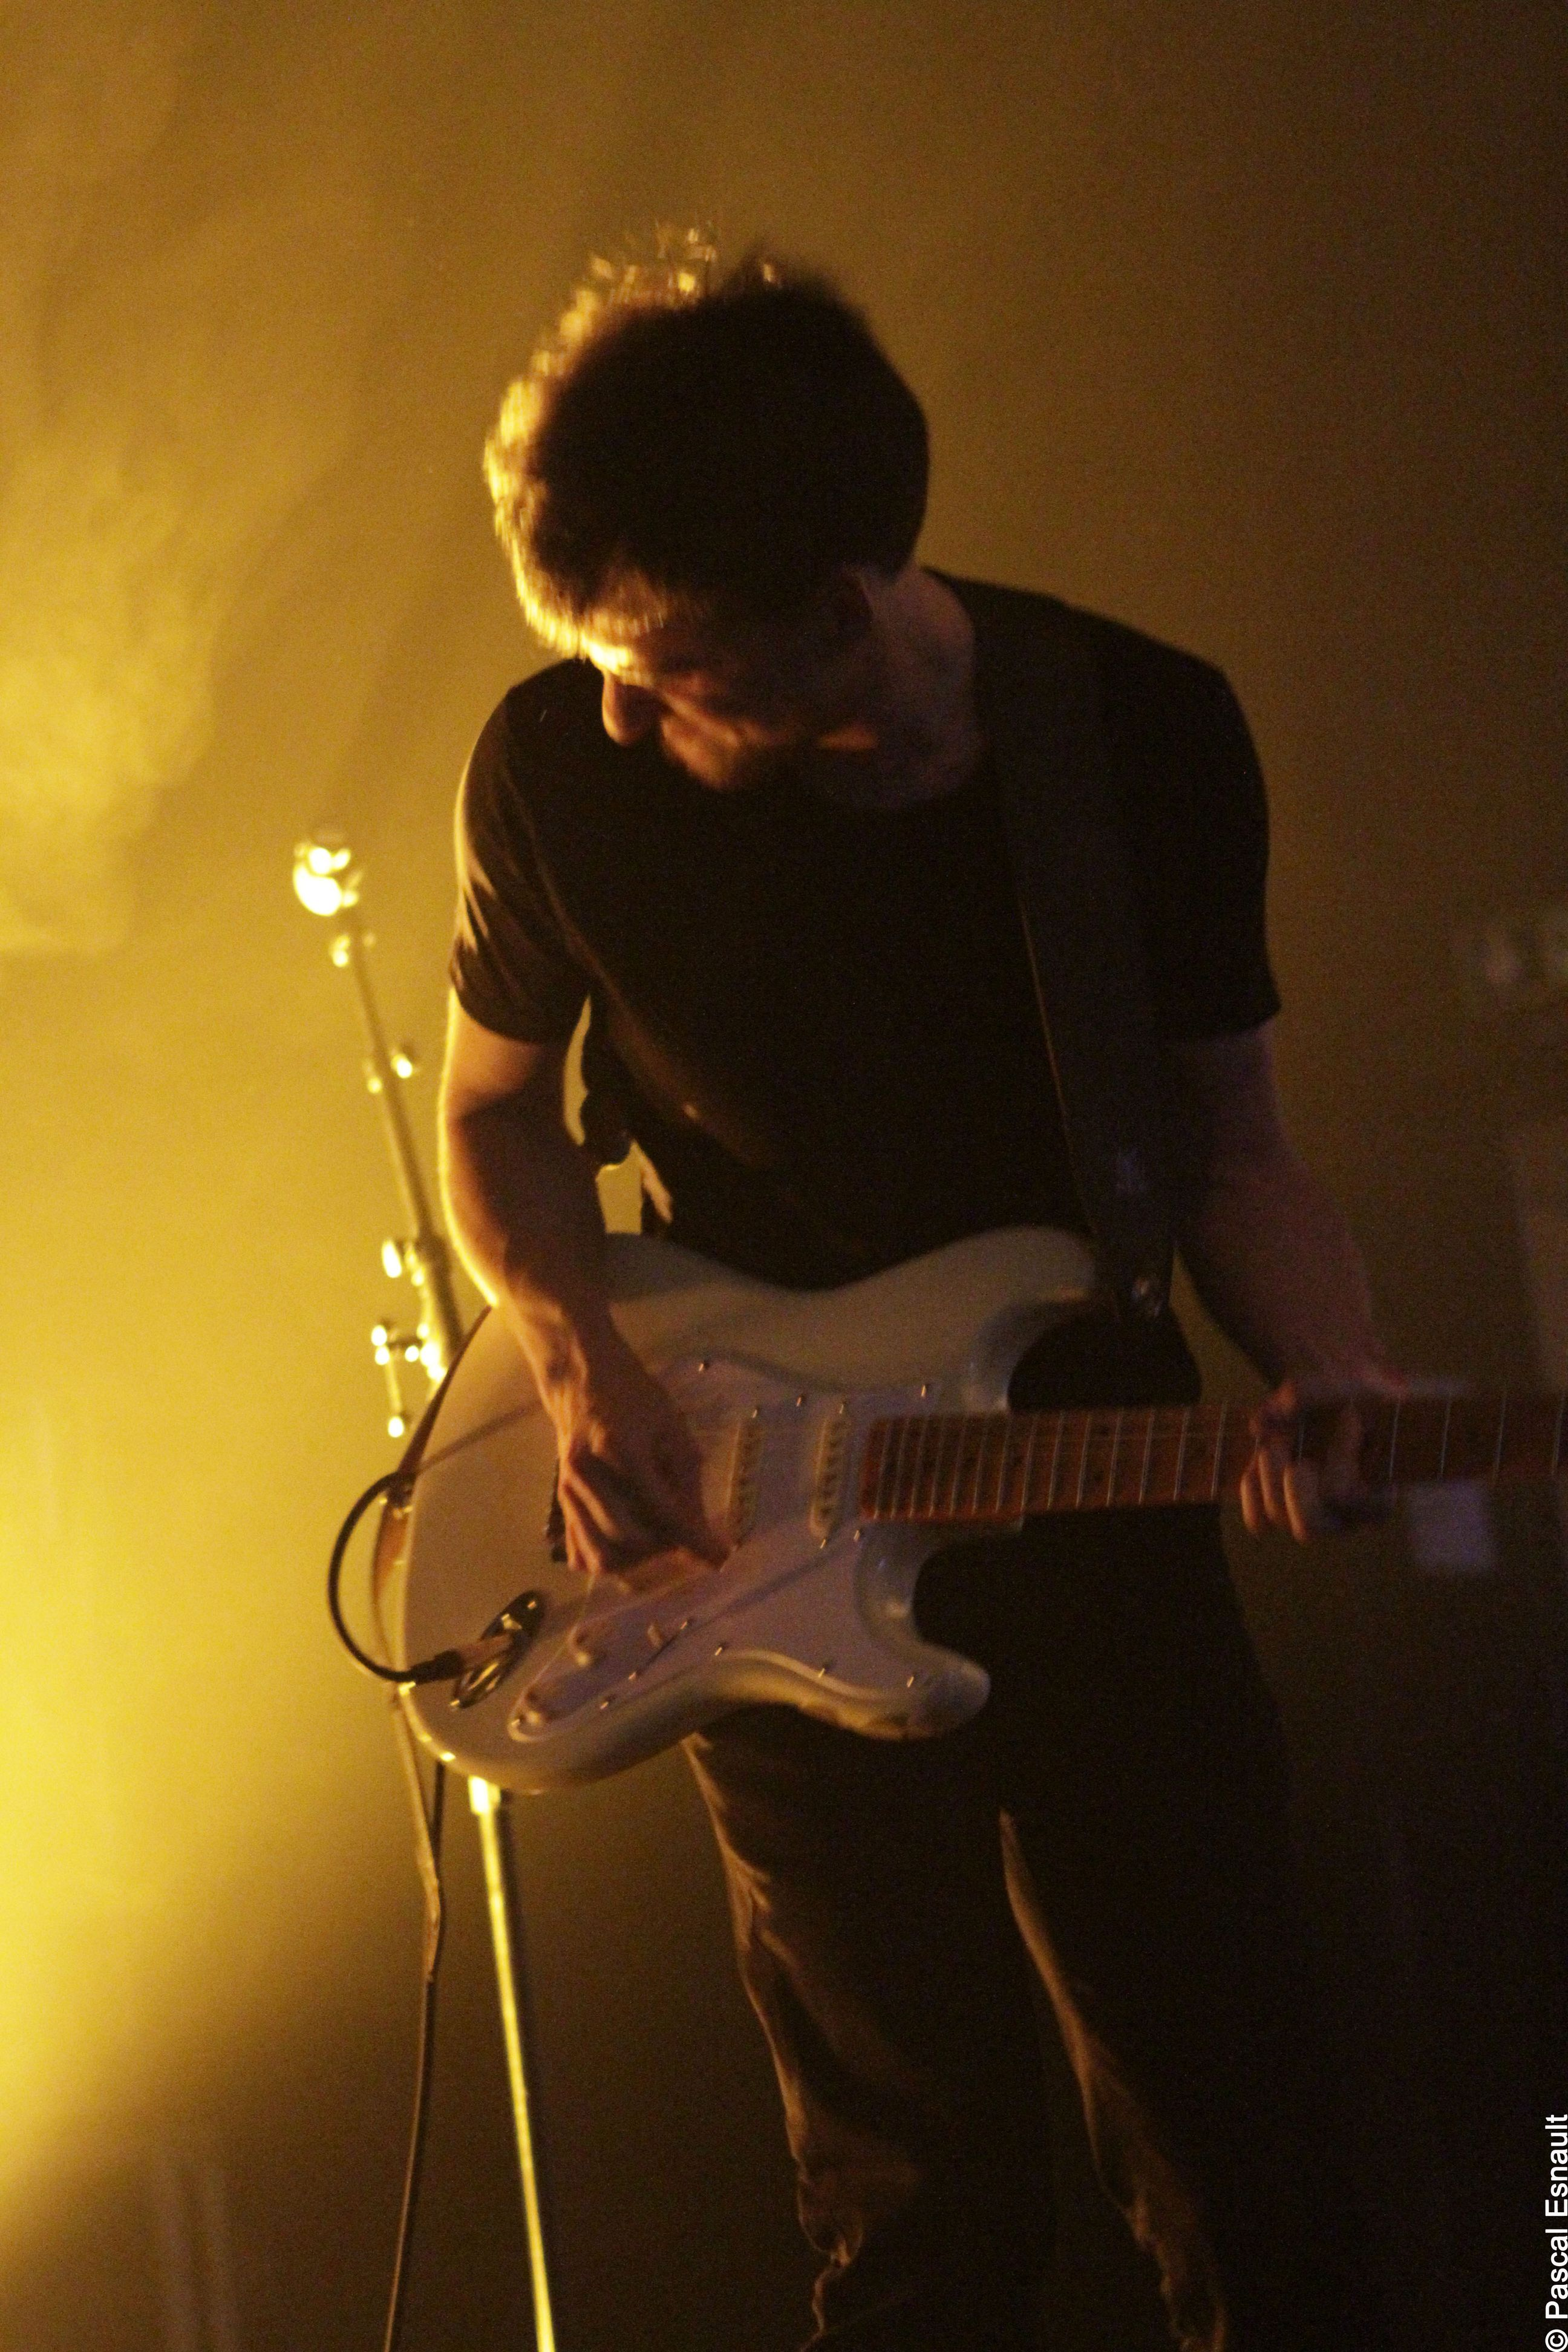 Concert Tati - 25/04/15 @Orsay - Crédits photo: Pascal Esnault